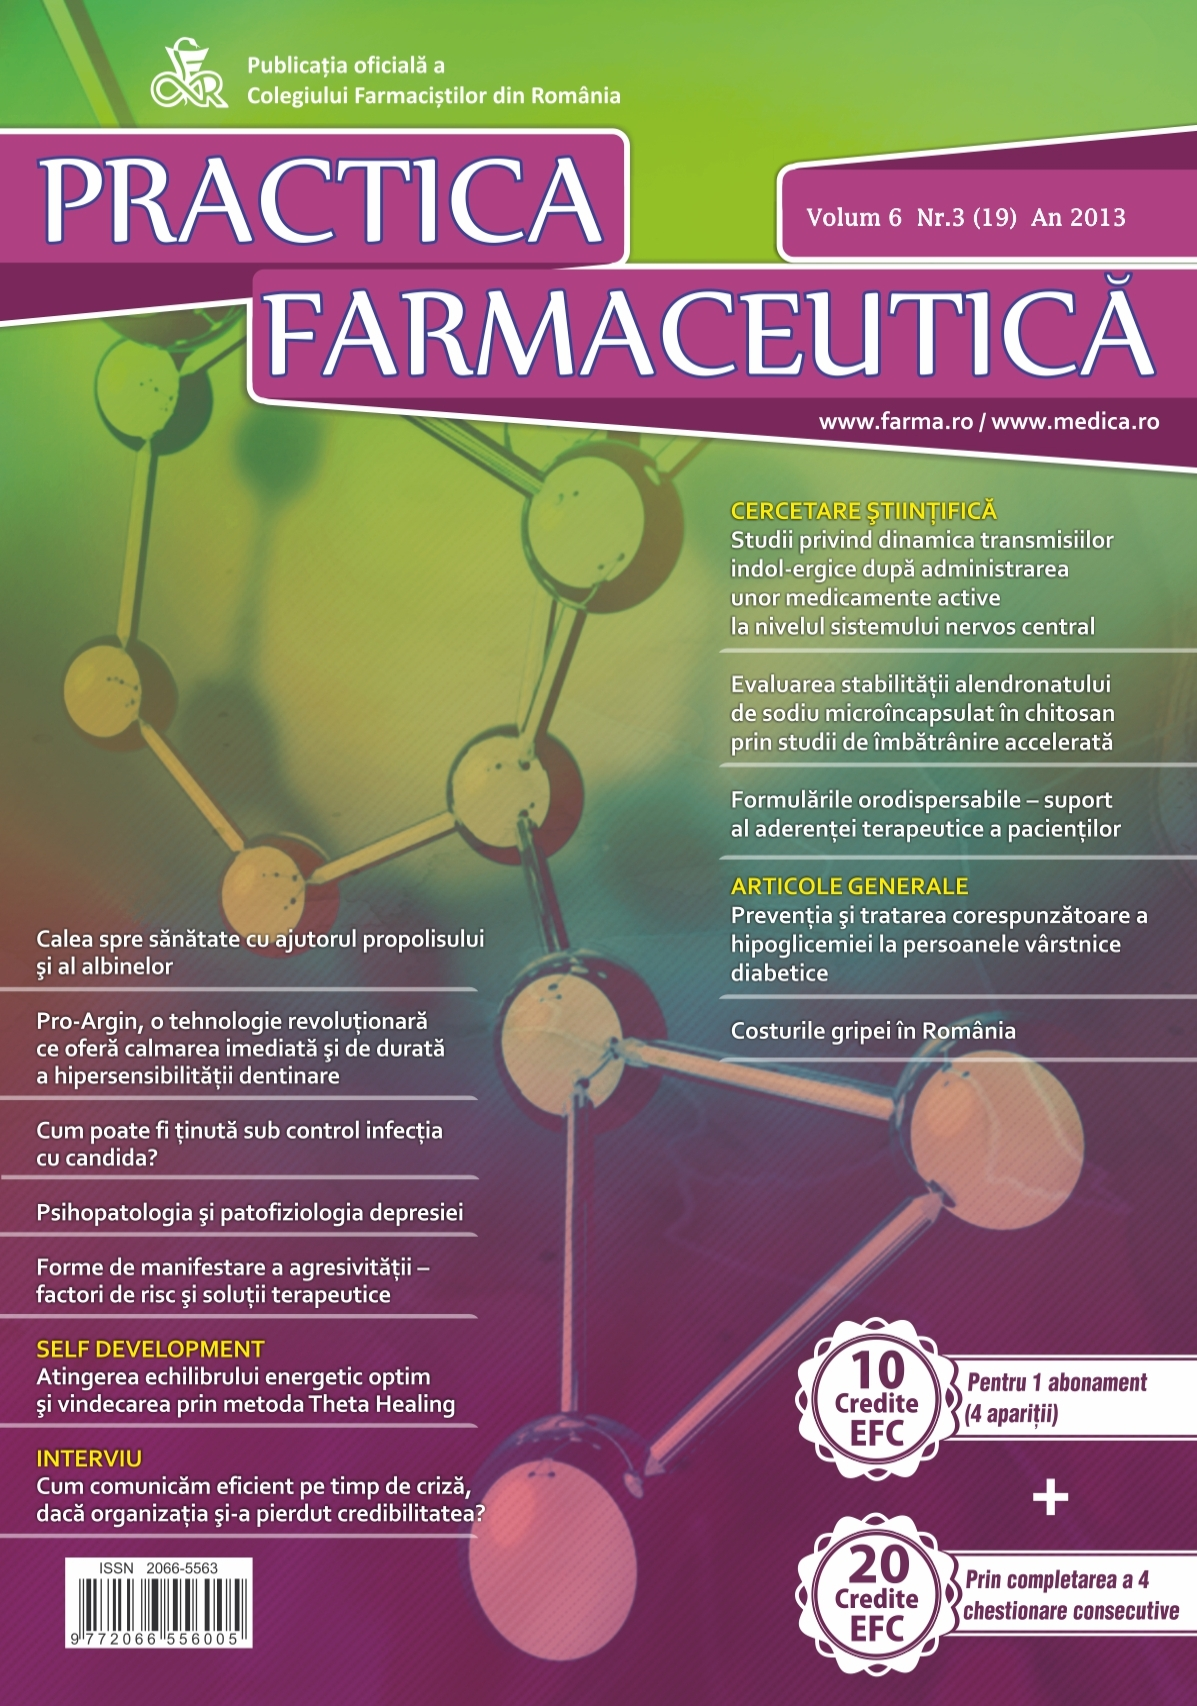 Revista Practica Farmaceutica, Vol. 6, Nr. 3 (19), 2013